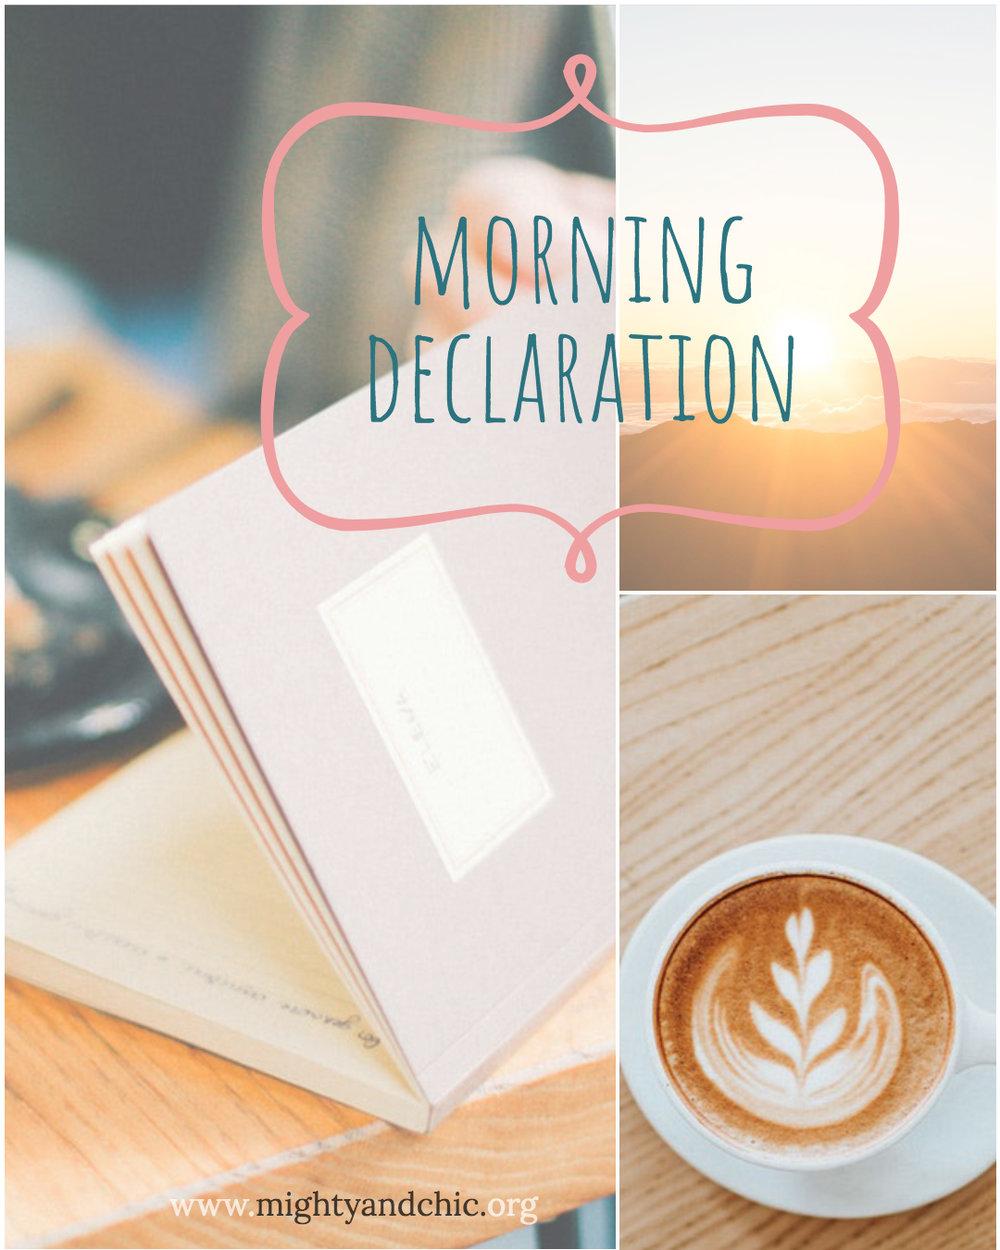 today-prayers-declarations.jpg